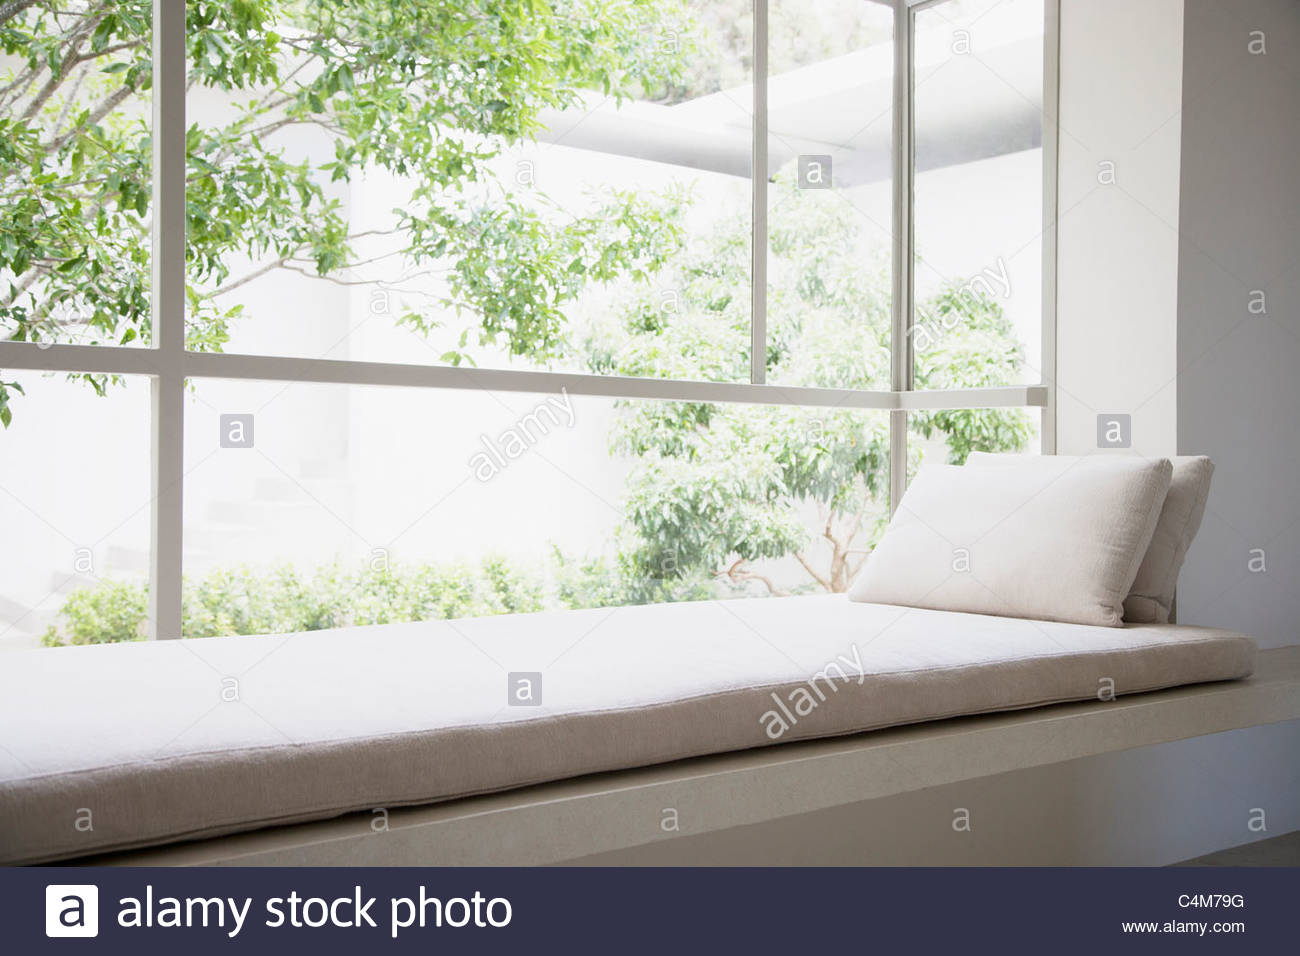 Asiento de la ventana Imagen De Stock